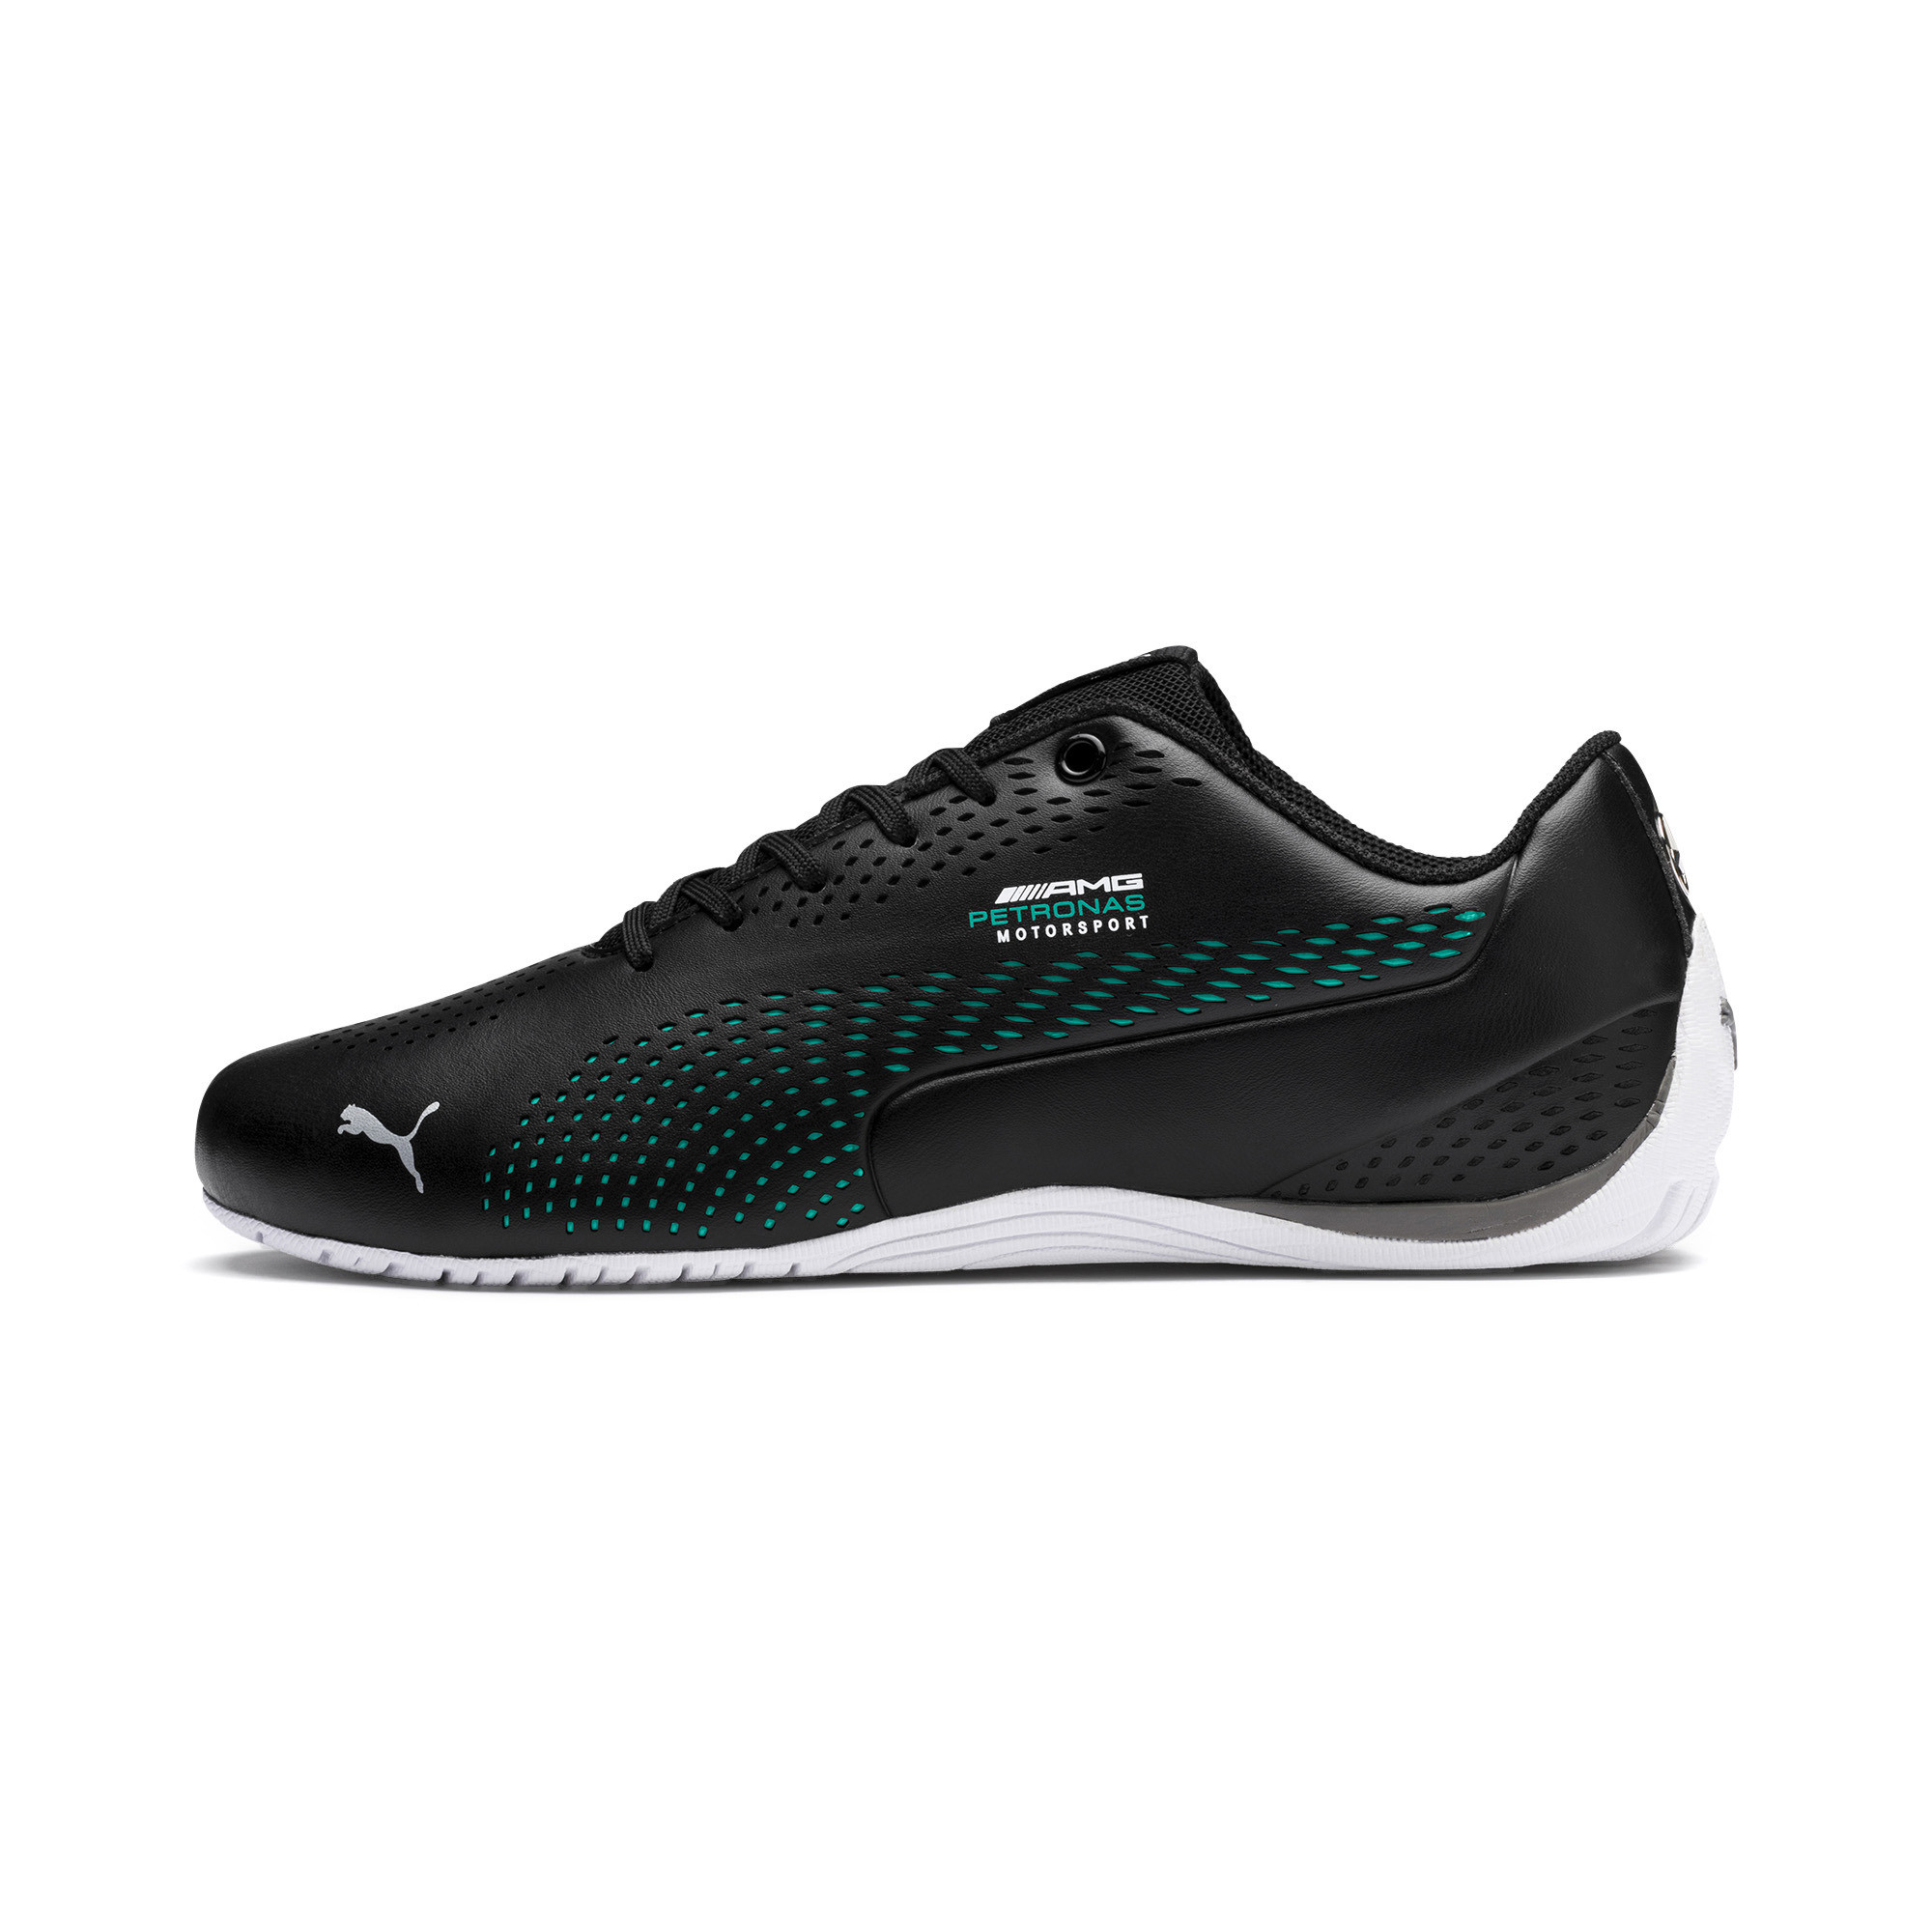 PUMA-Mercedes-AMG-Petronas-Drift-Cat-5-Ultra-II-Sneaker-Unisex-Schuhe-Neu Indexbild 9